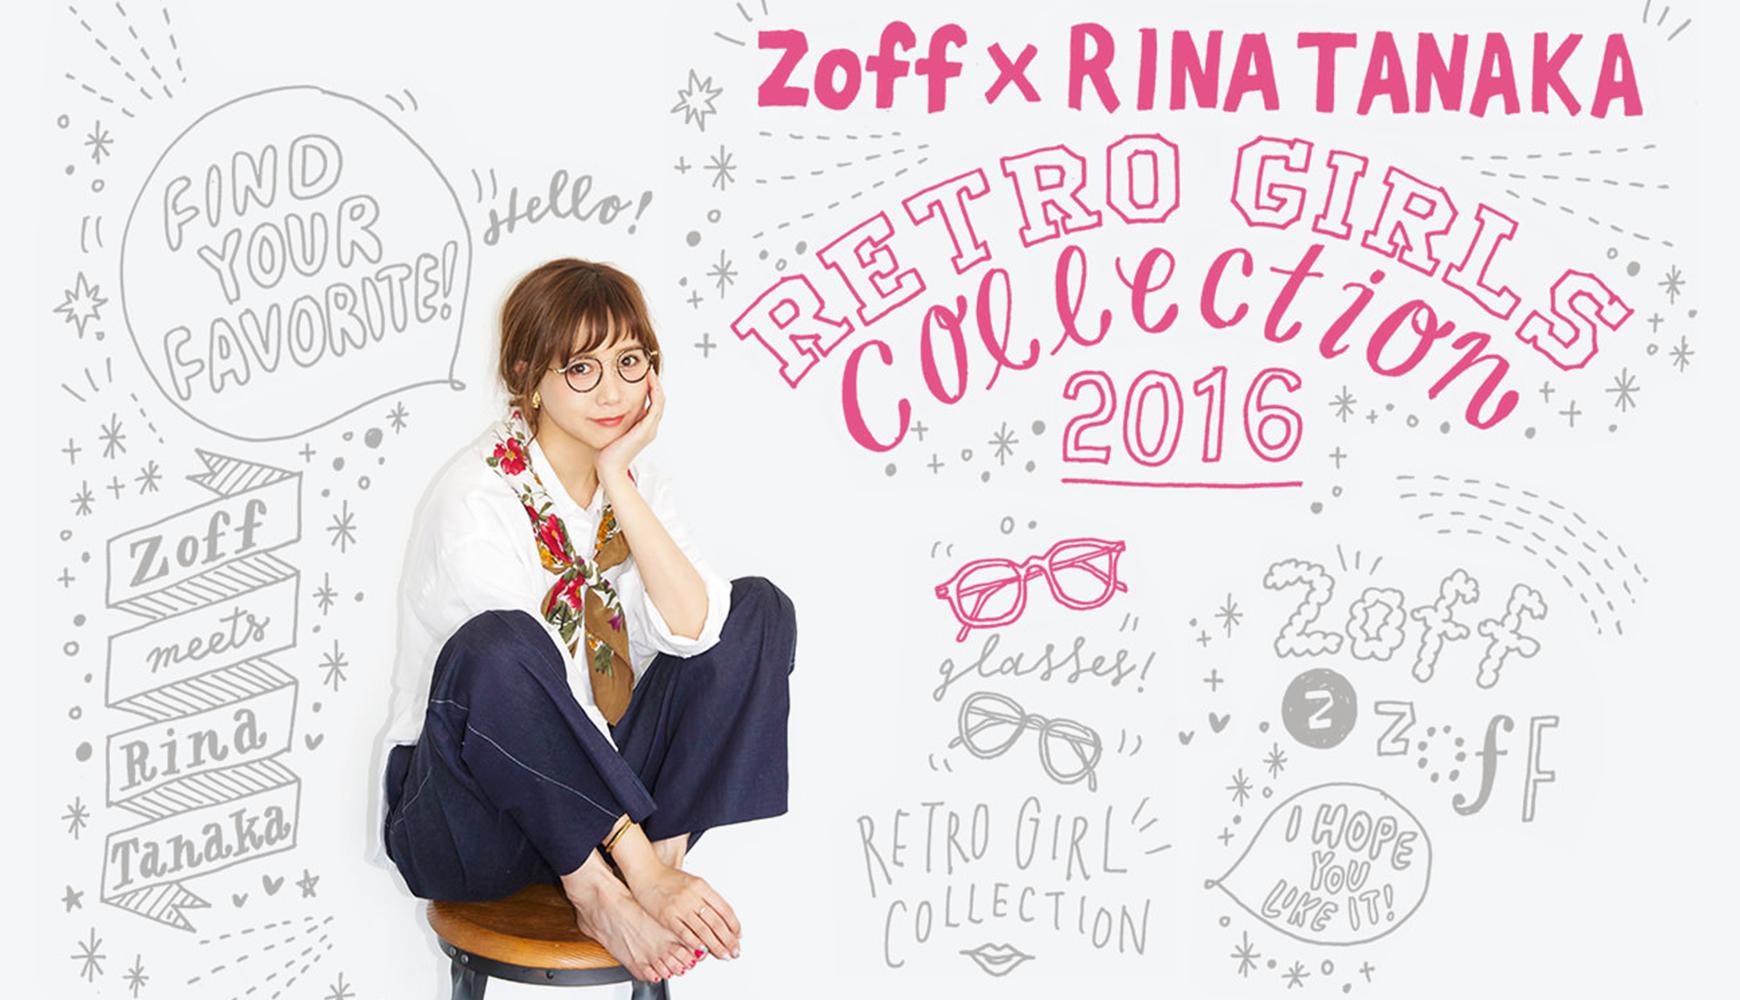 Zoffから人気モデル田中里奈がプロデュースするメガネコレクションが登場! オンライン先行予約が7月22日から開始